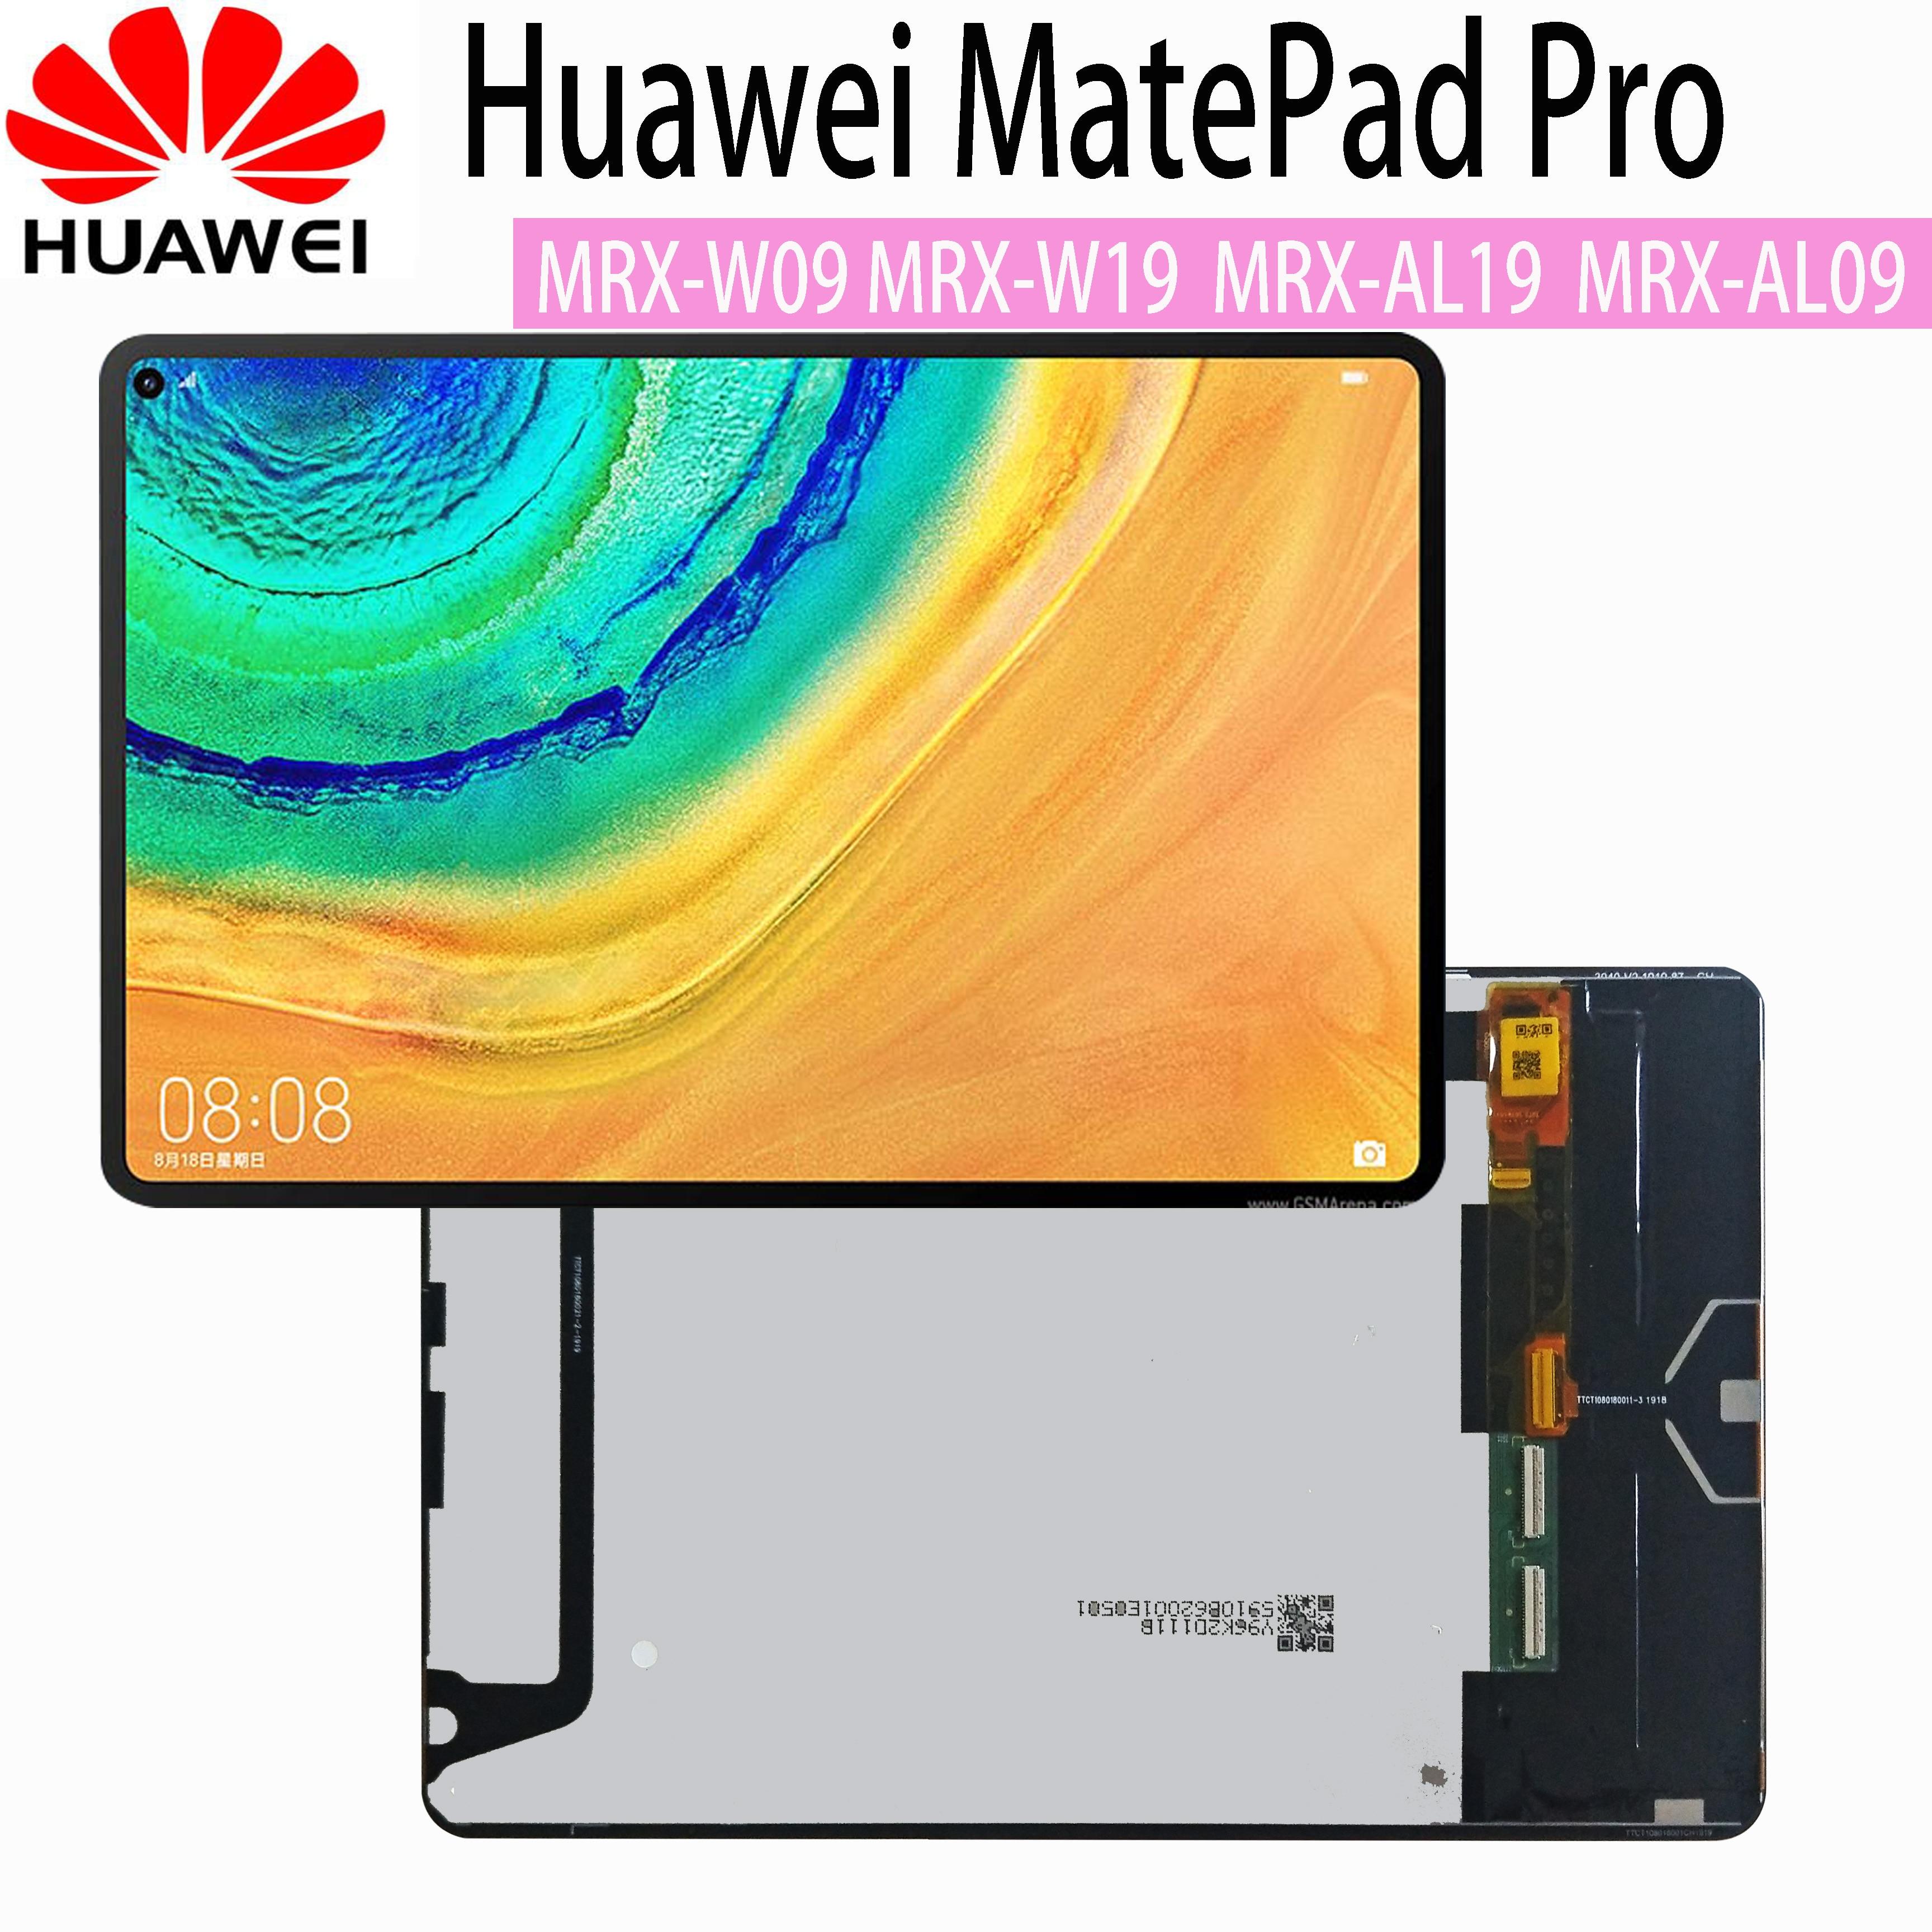 Originale 10.8 per Huawei Matepad Pro MRX W09 MRX W19 MRX AL19 MRX AL09 Display Lcd con Touch Screen Digitizer Assembly